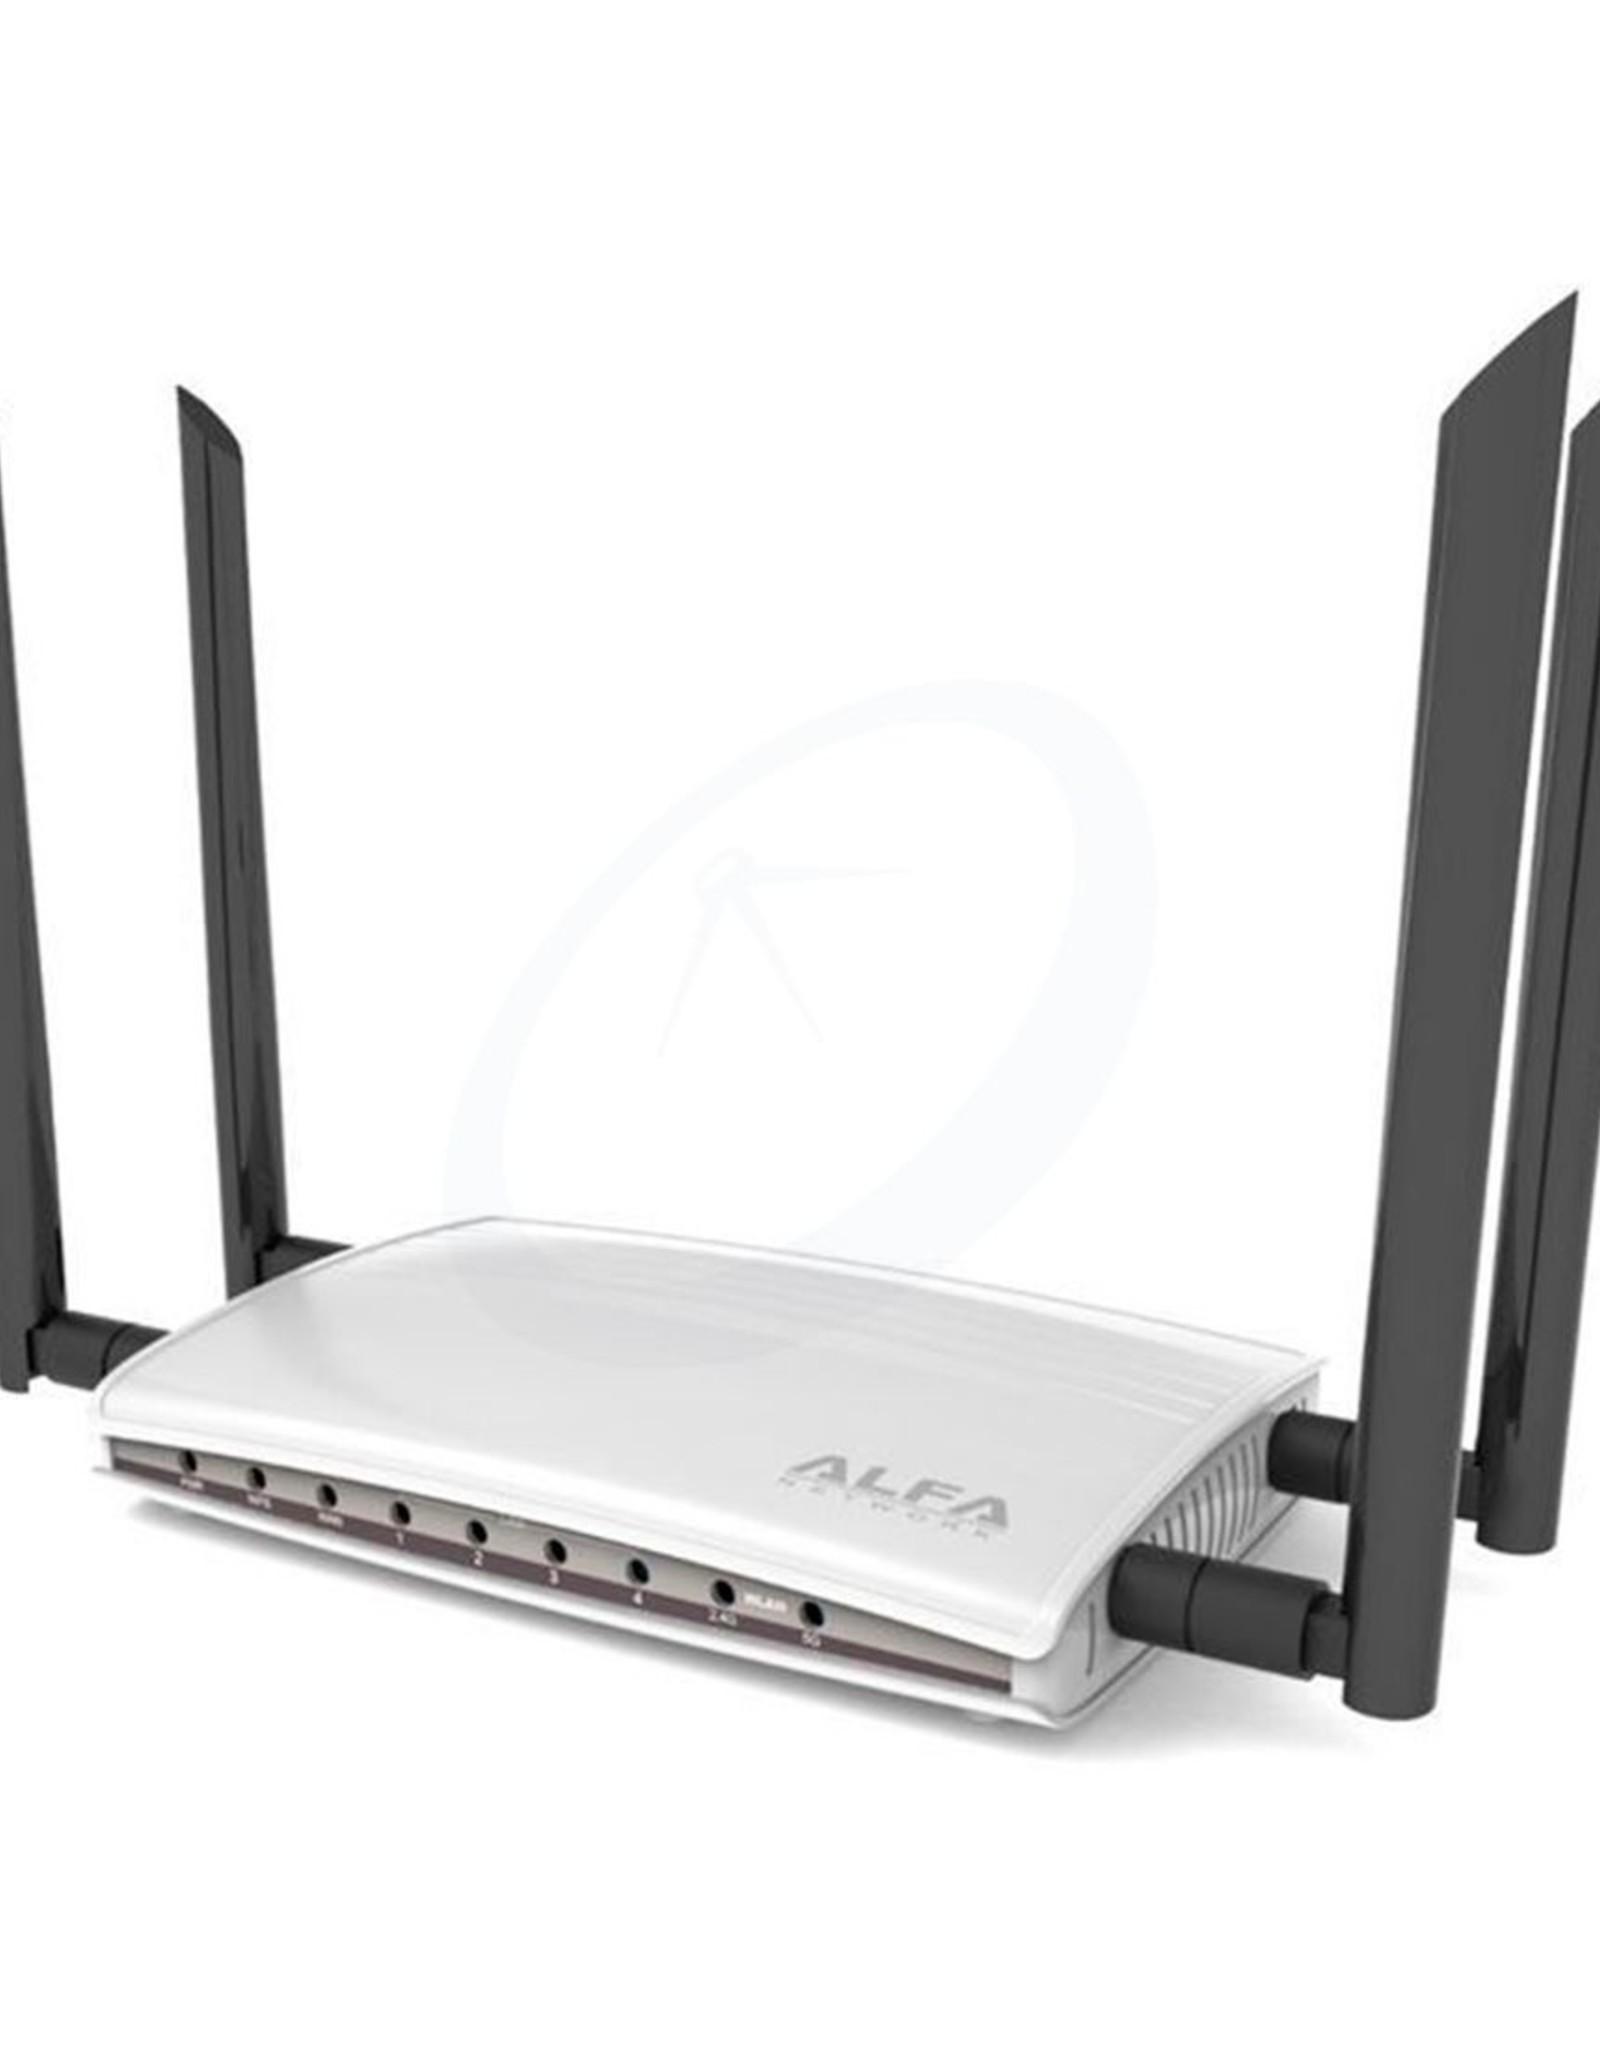 Alfa Network - AC1200R - WiFi Router - Wide Range - High Gain